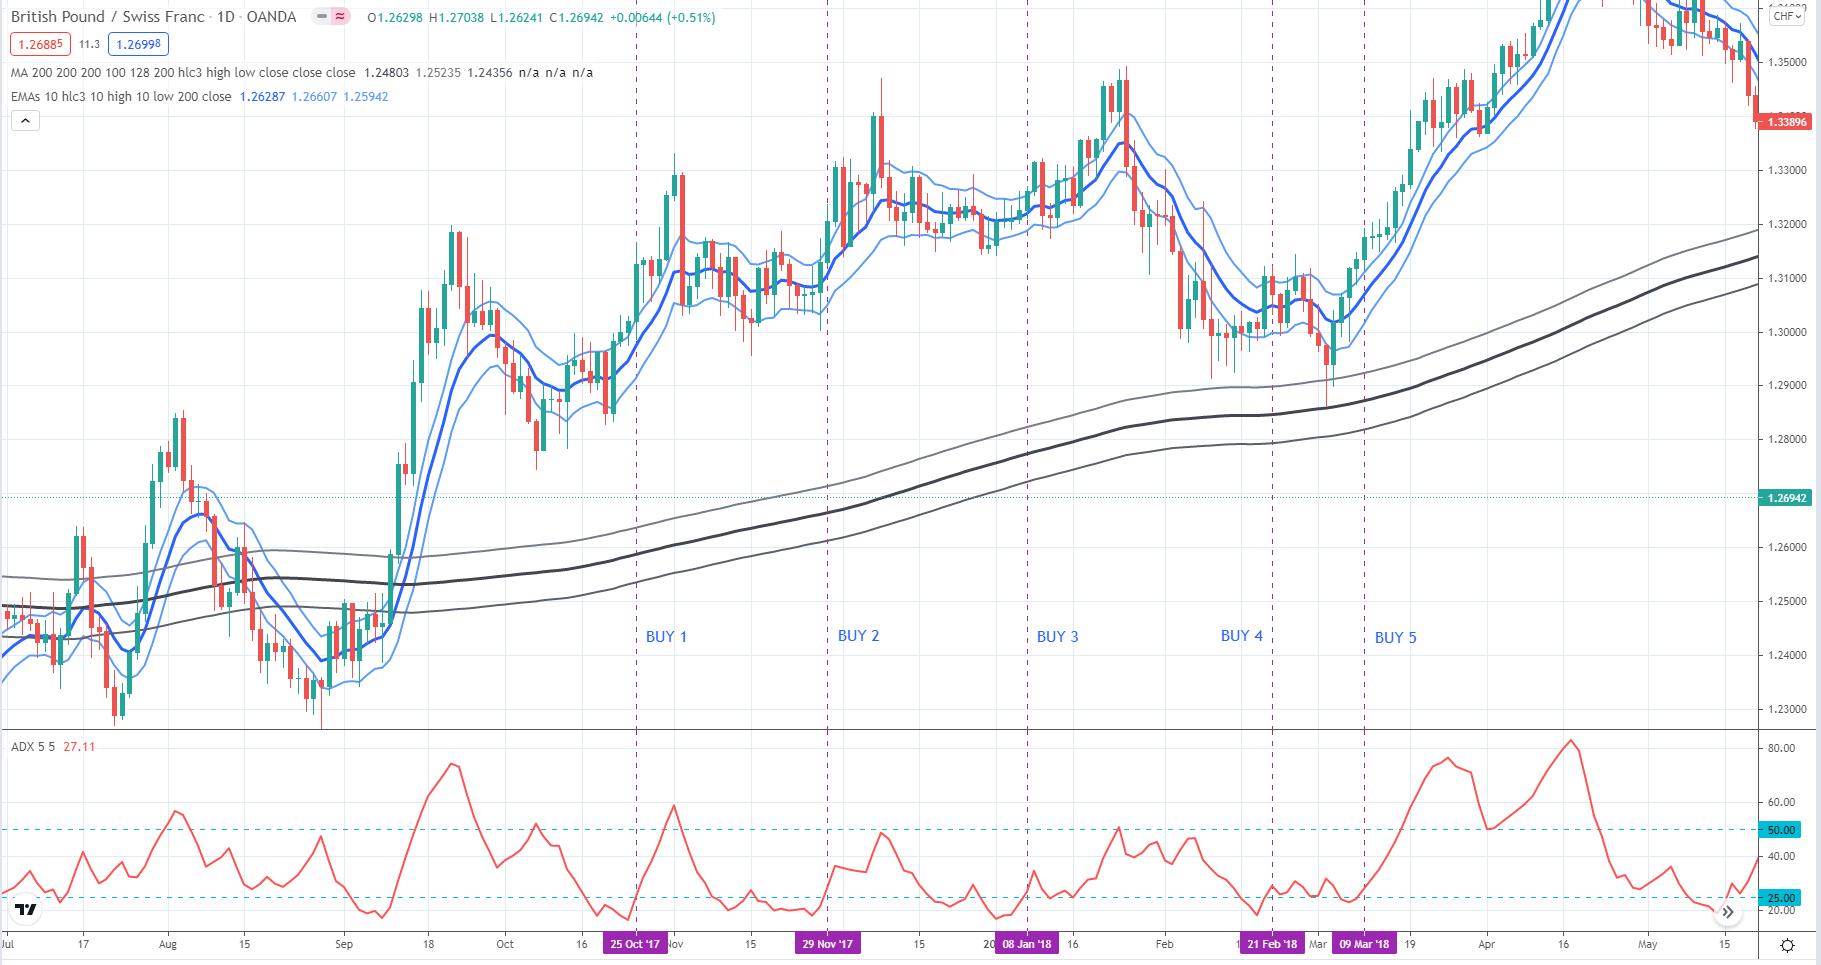 British Pound/Swiss Franc